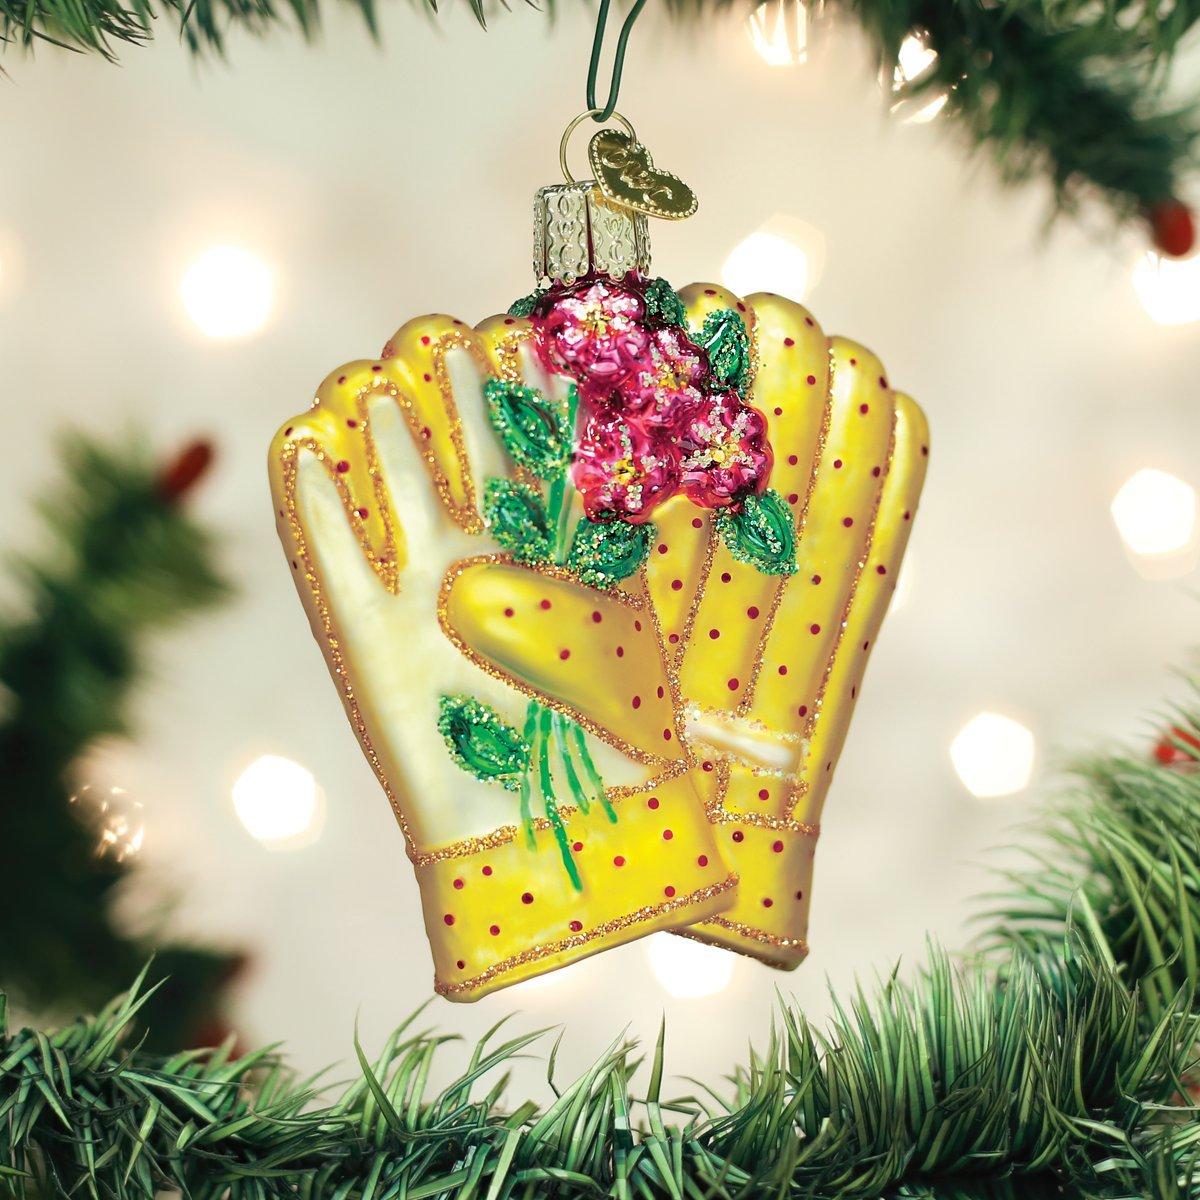 Old World Christmas 32329 Ornament Gardening Gloves